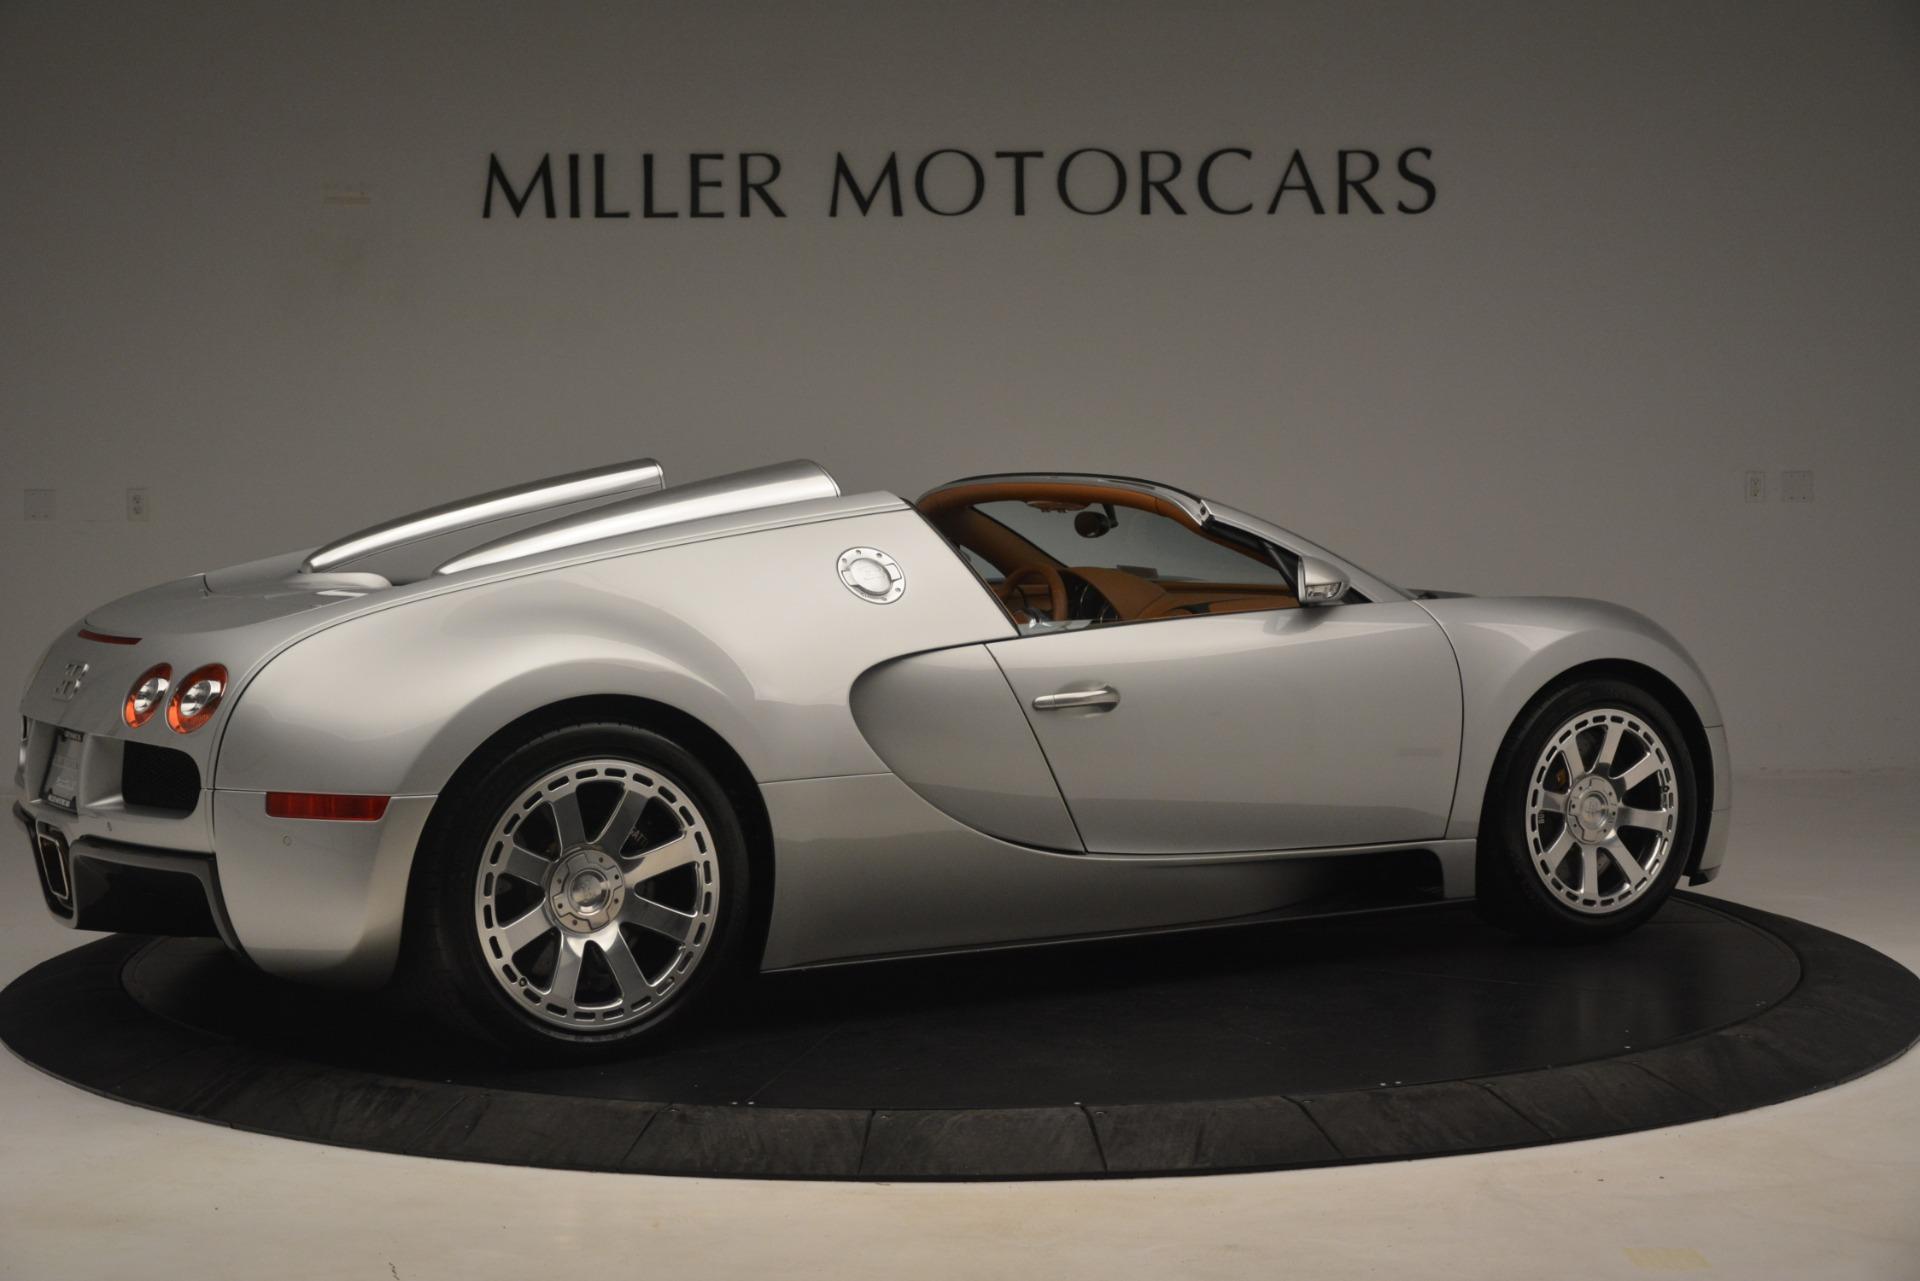 Used 2010 Bugatti Veyron 16.4 Grand Sport For Sale In Greenwich, CT 3159_p9